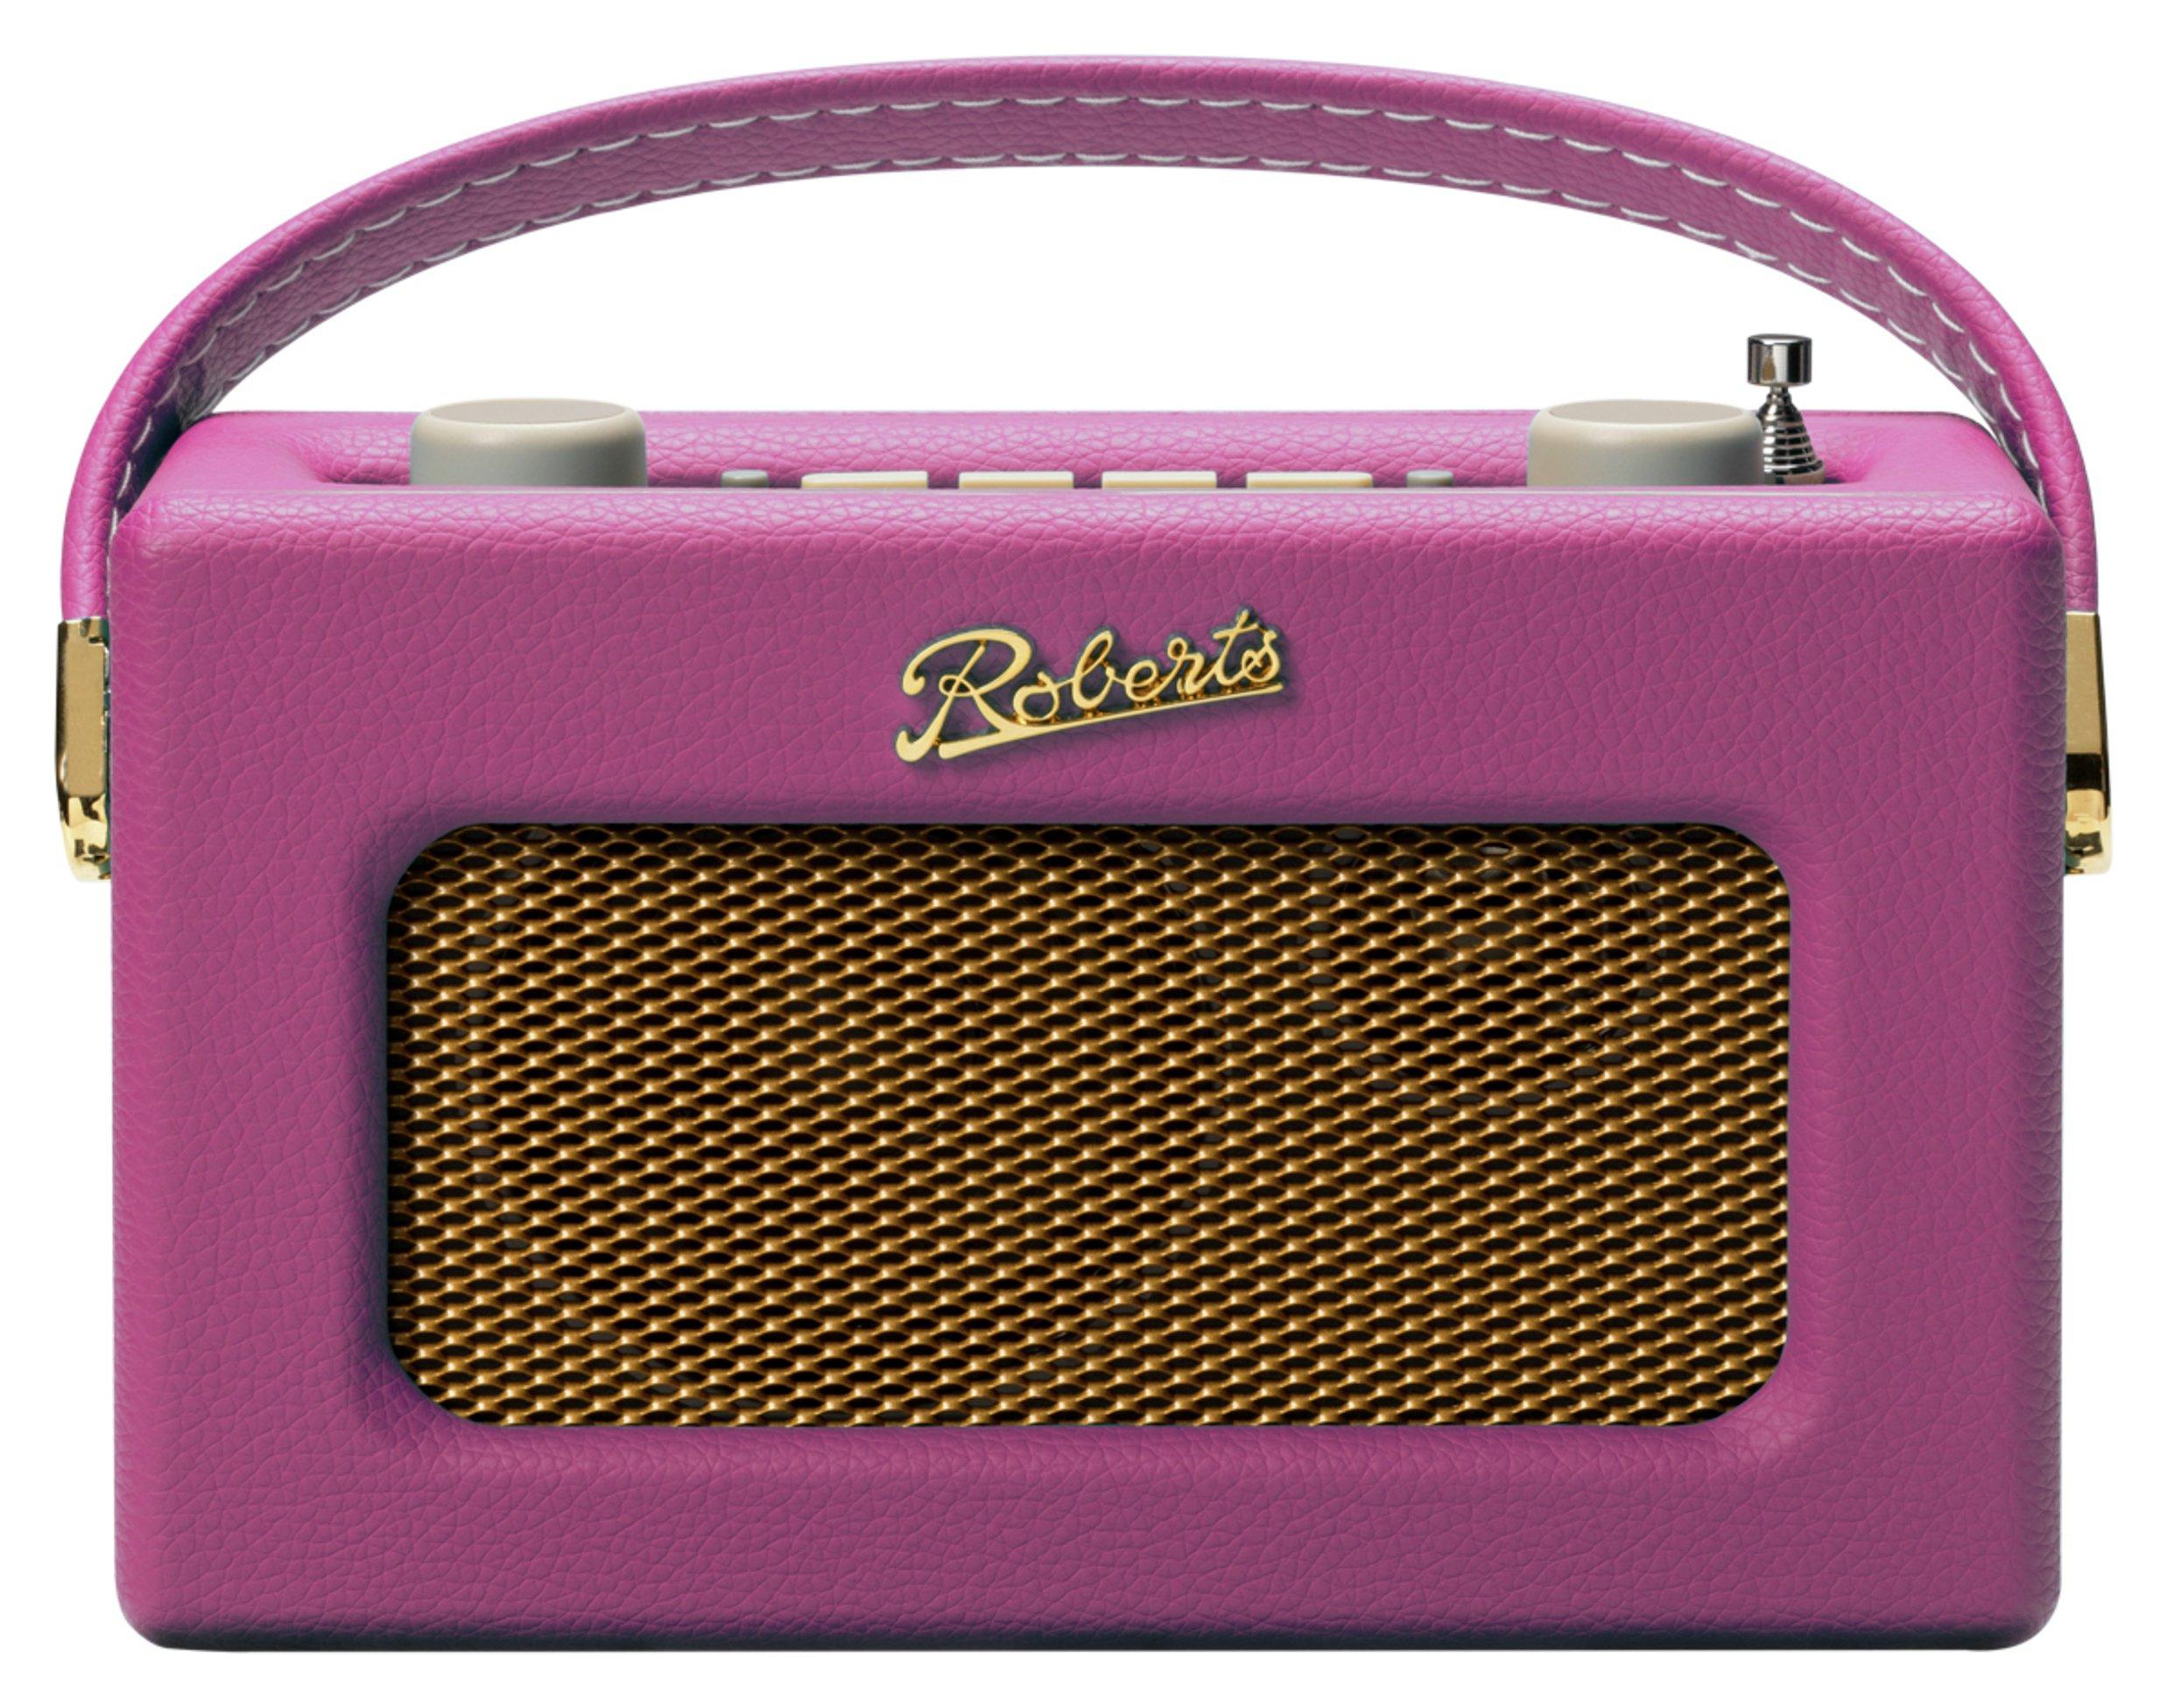 Roberts Revival Uno DAB / DAB+ / FM Digital Radio - Pink